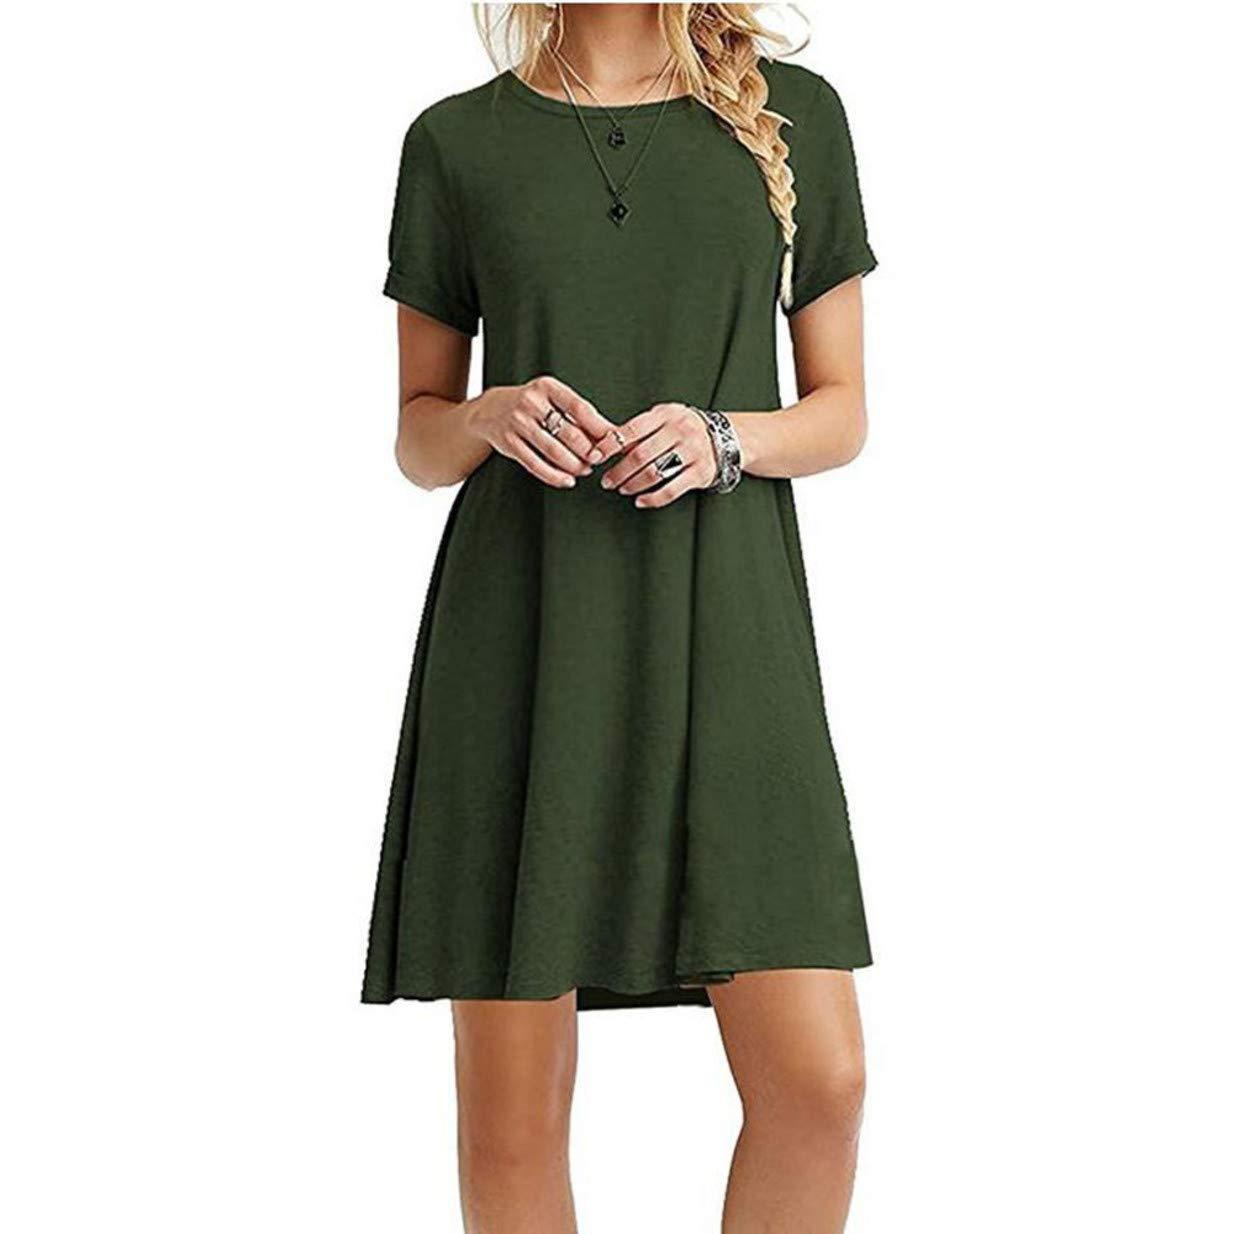 Green Artreurfomrdh Women's Short Sleeve Simple Flowy Comfy Loose Dress